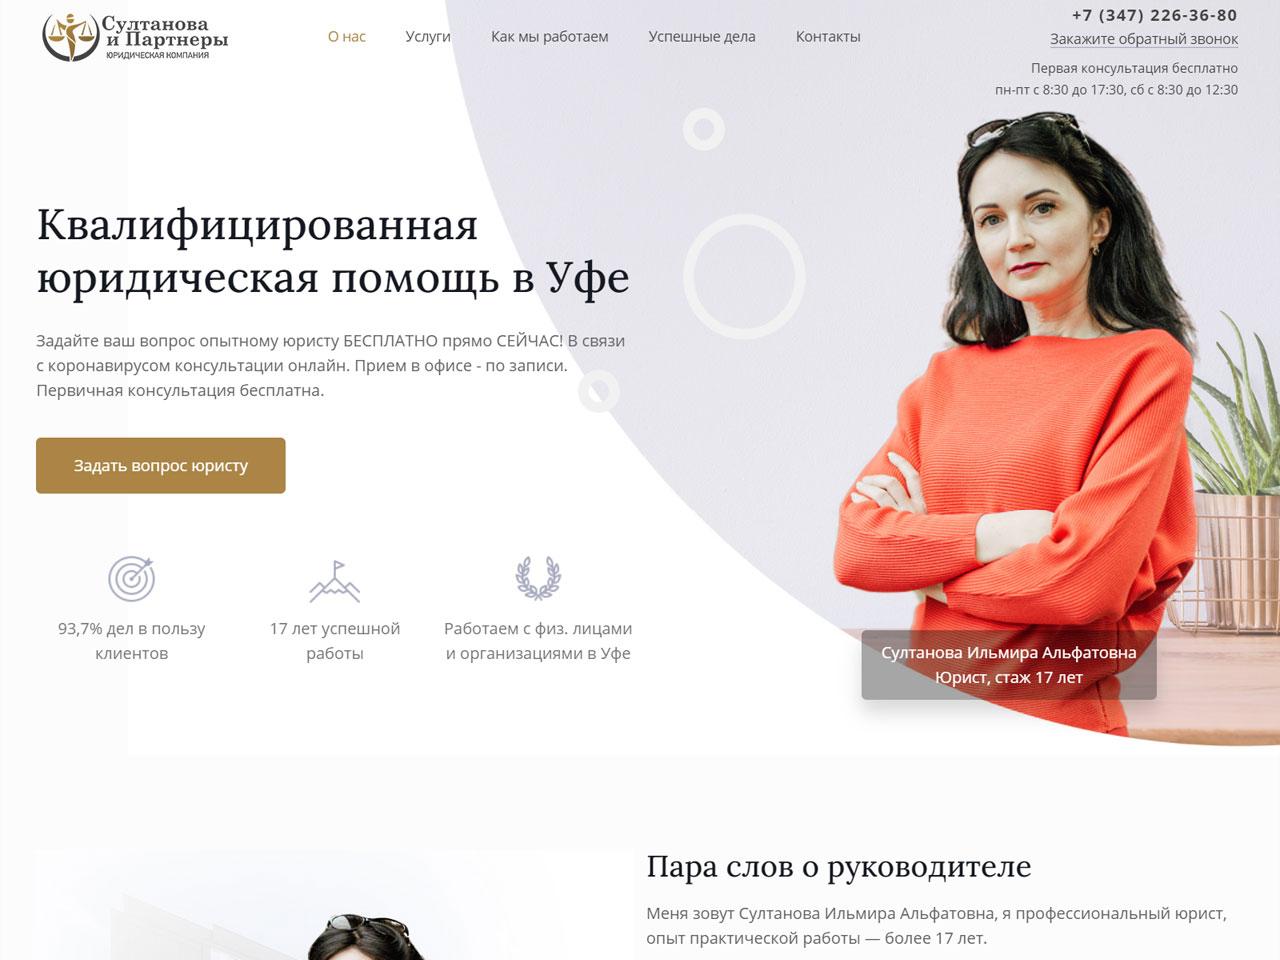 Сайт Юриста в Уфе